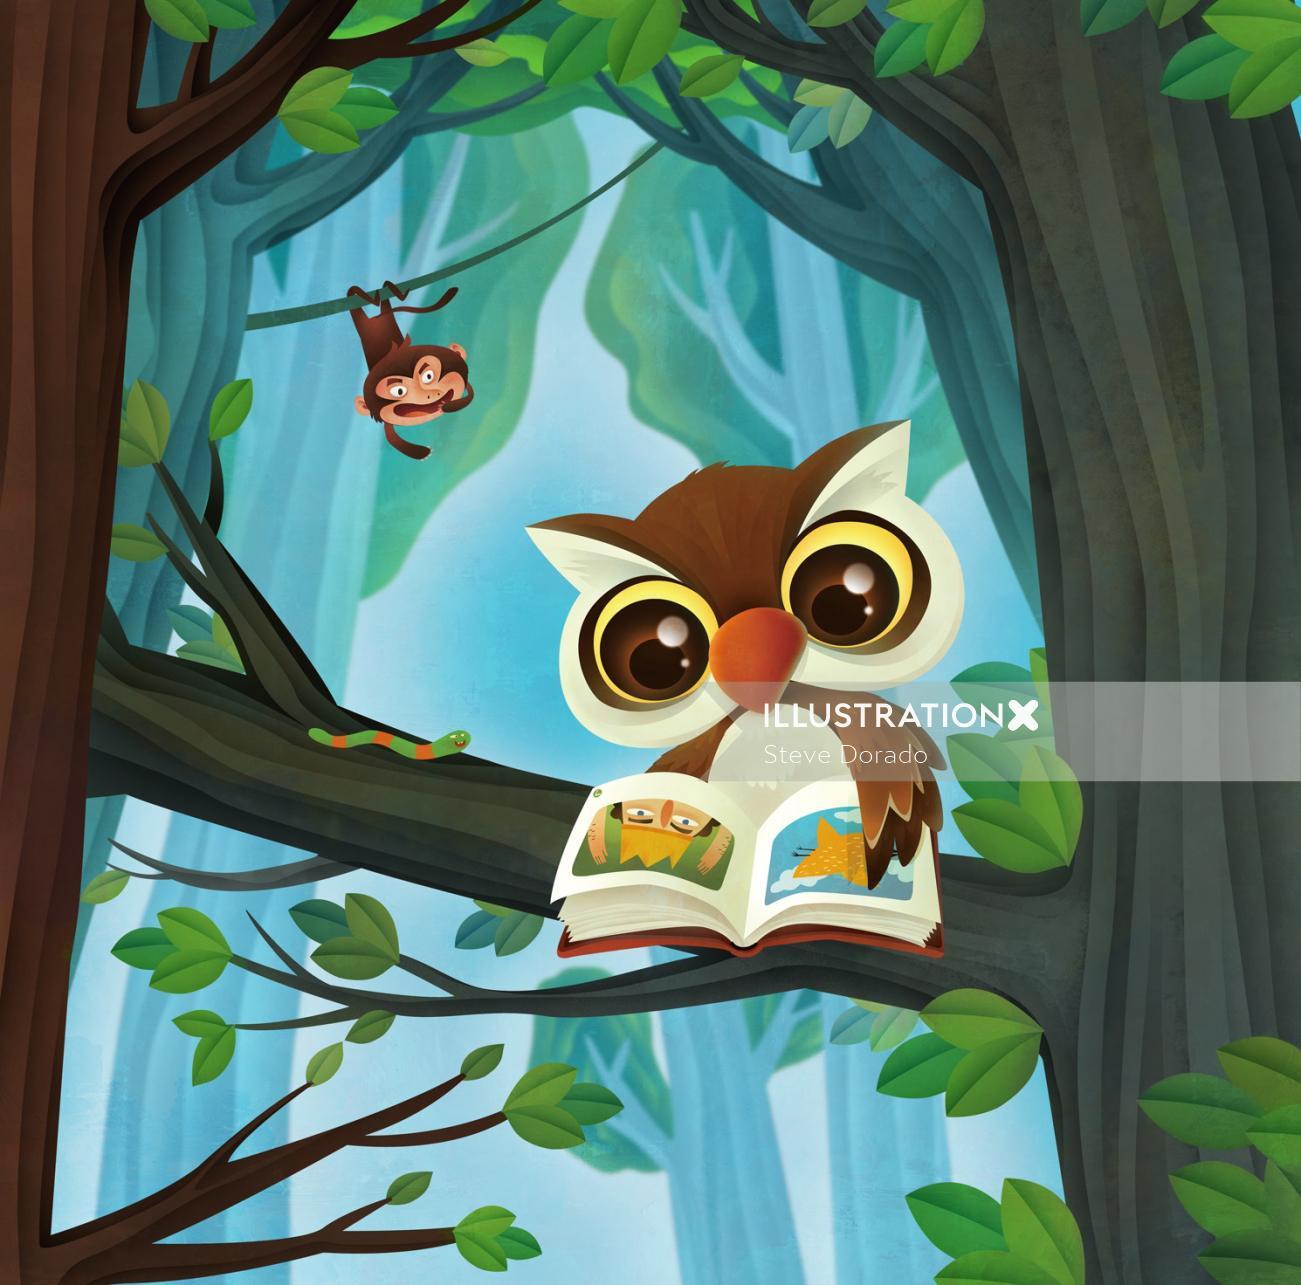 Comic owl illustration by Steve Dorado